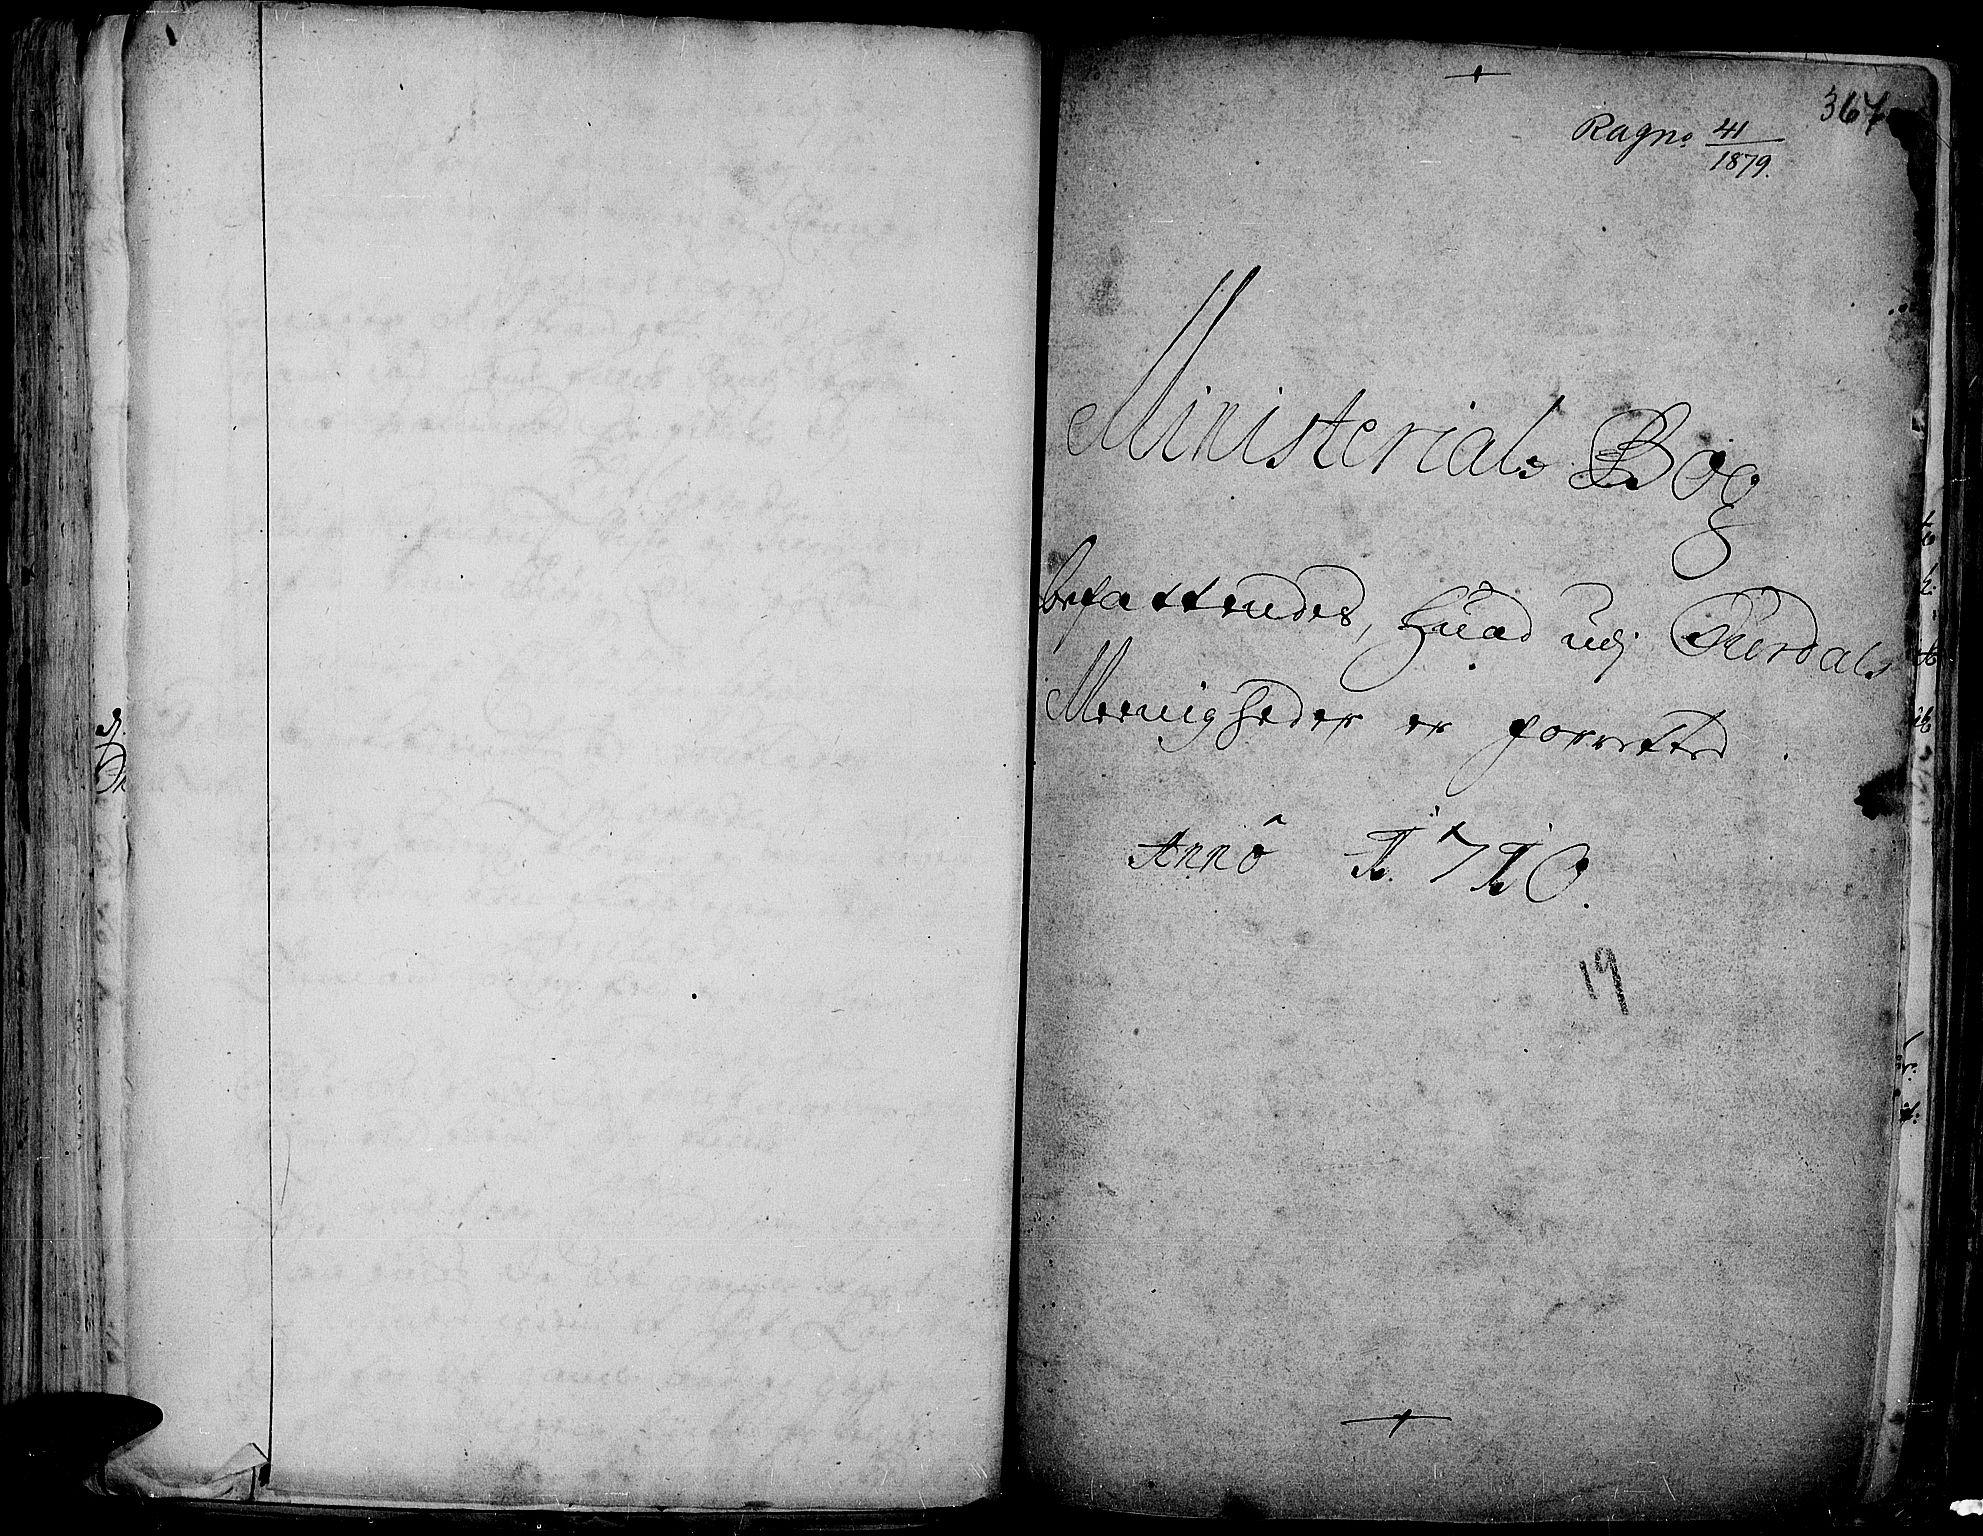 SAH, Aurdal prestekontor, Ministerialbok nr. 1-3, 1692-1730, s. 367